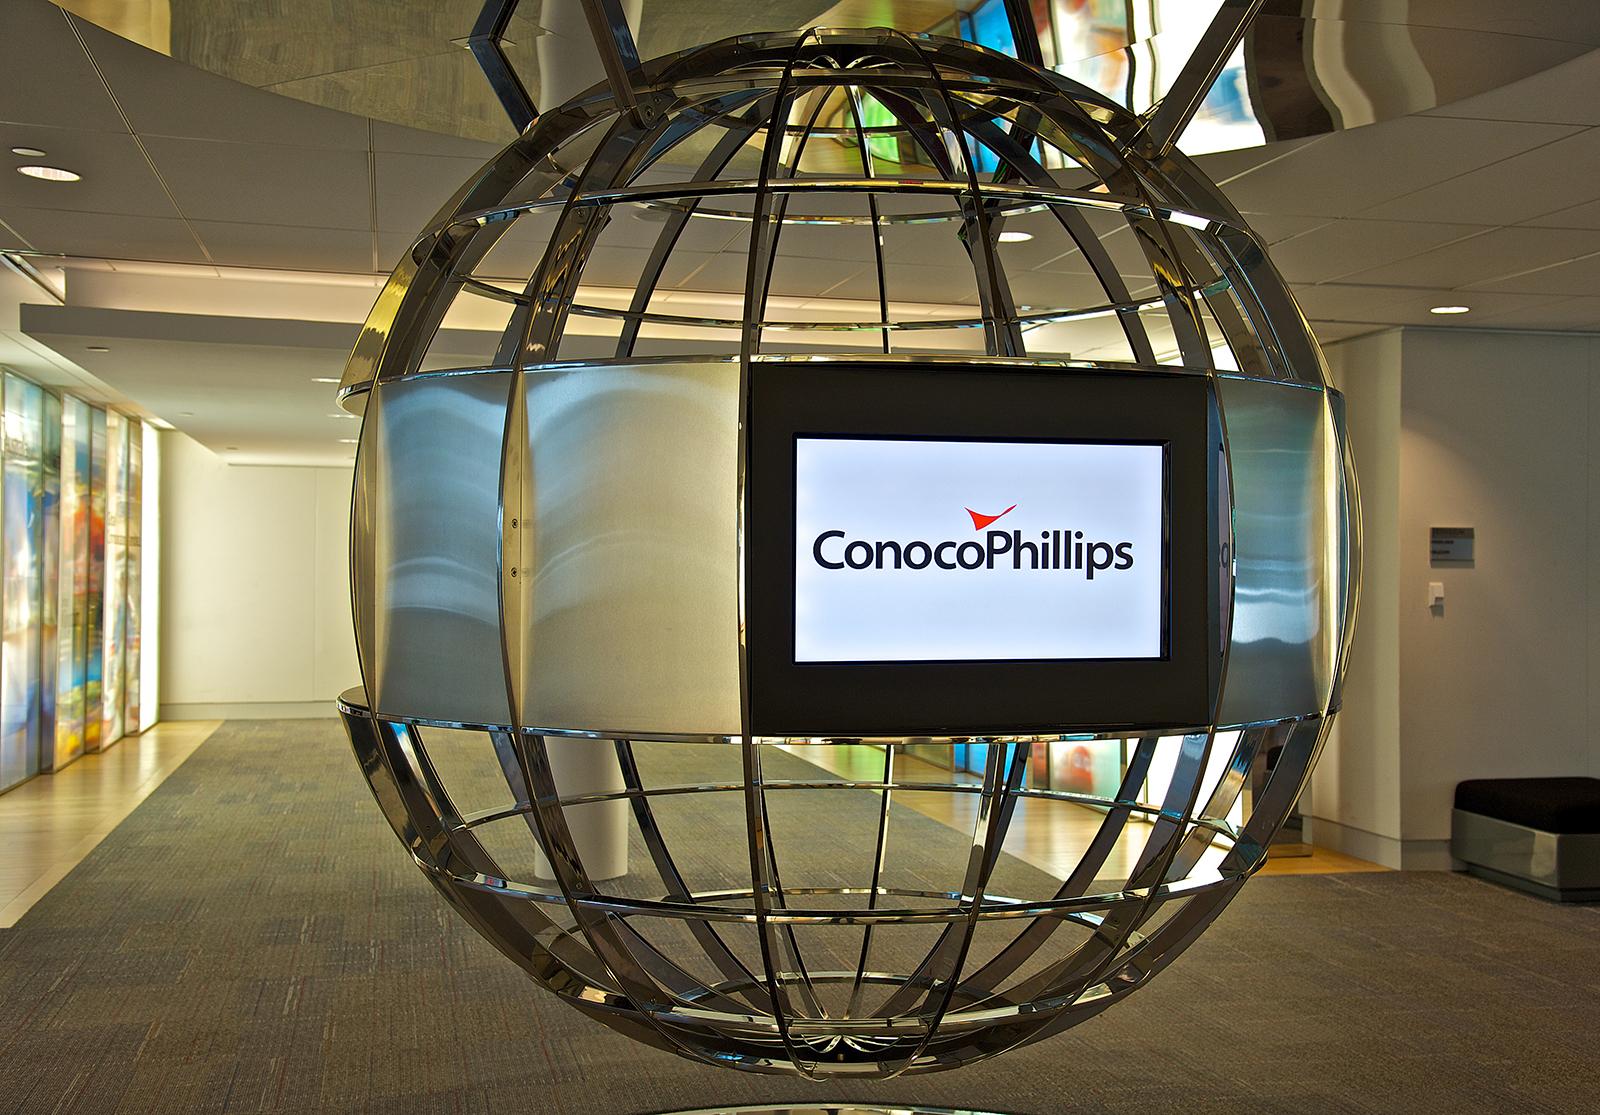 ConocoPhillips news